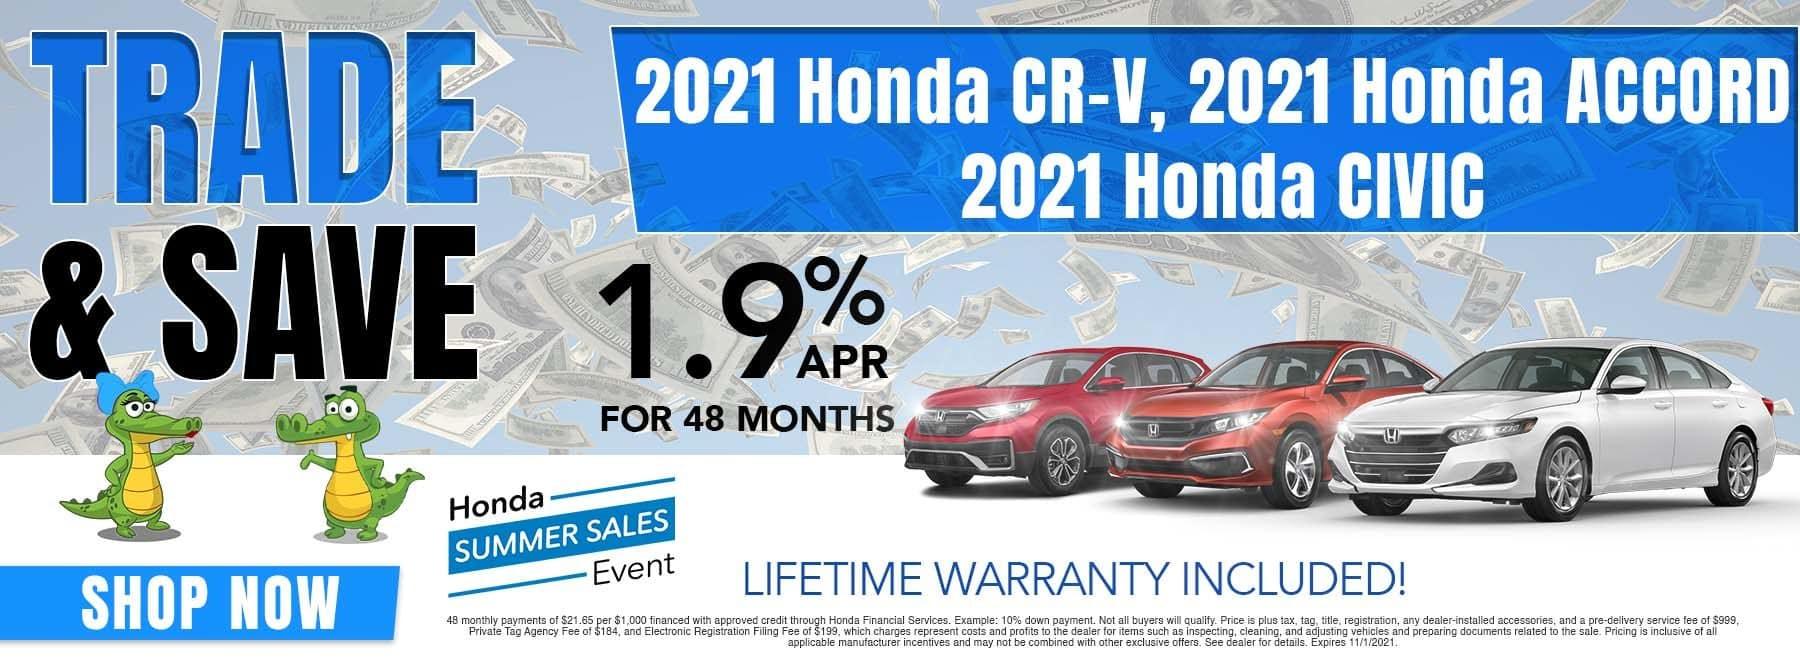 Trade & Save | 2021 Honda CR-V, 2021 Honda Accord, 2021 Honda Civic | 1.9% APR For 48 Months | Lifetime Warranty Included!